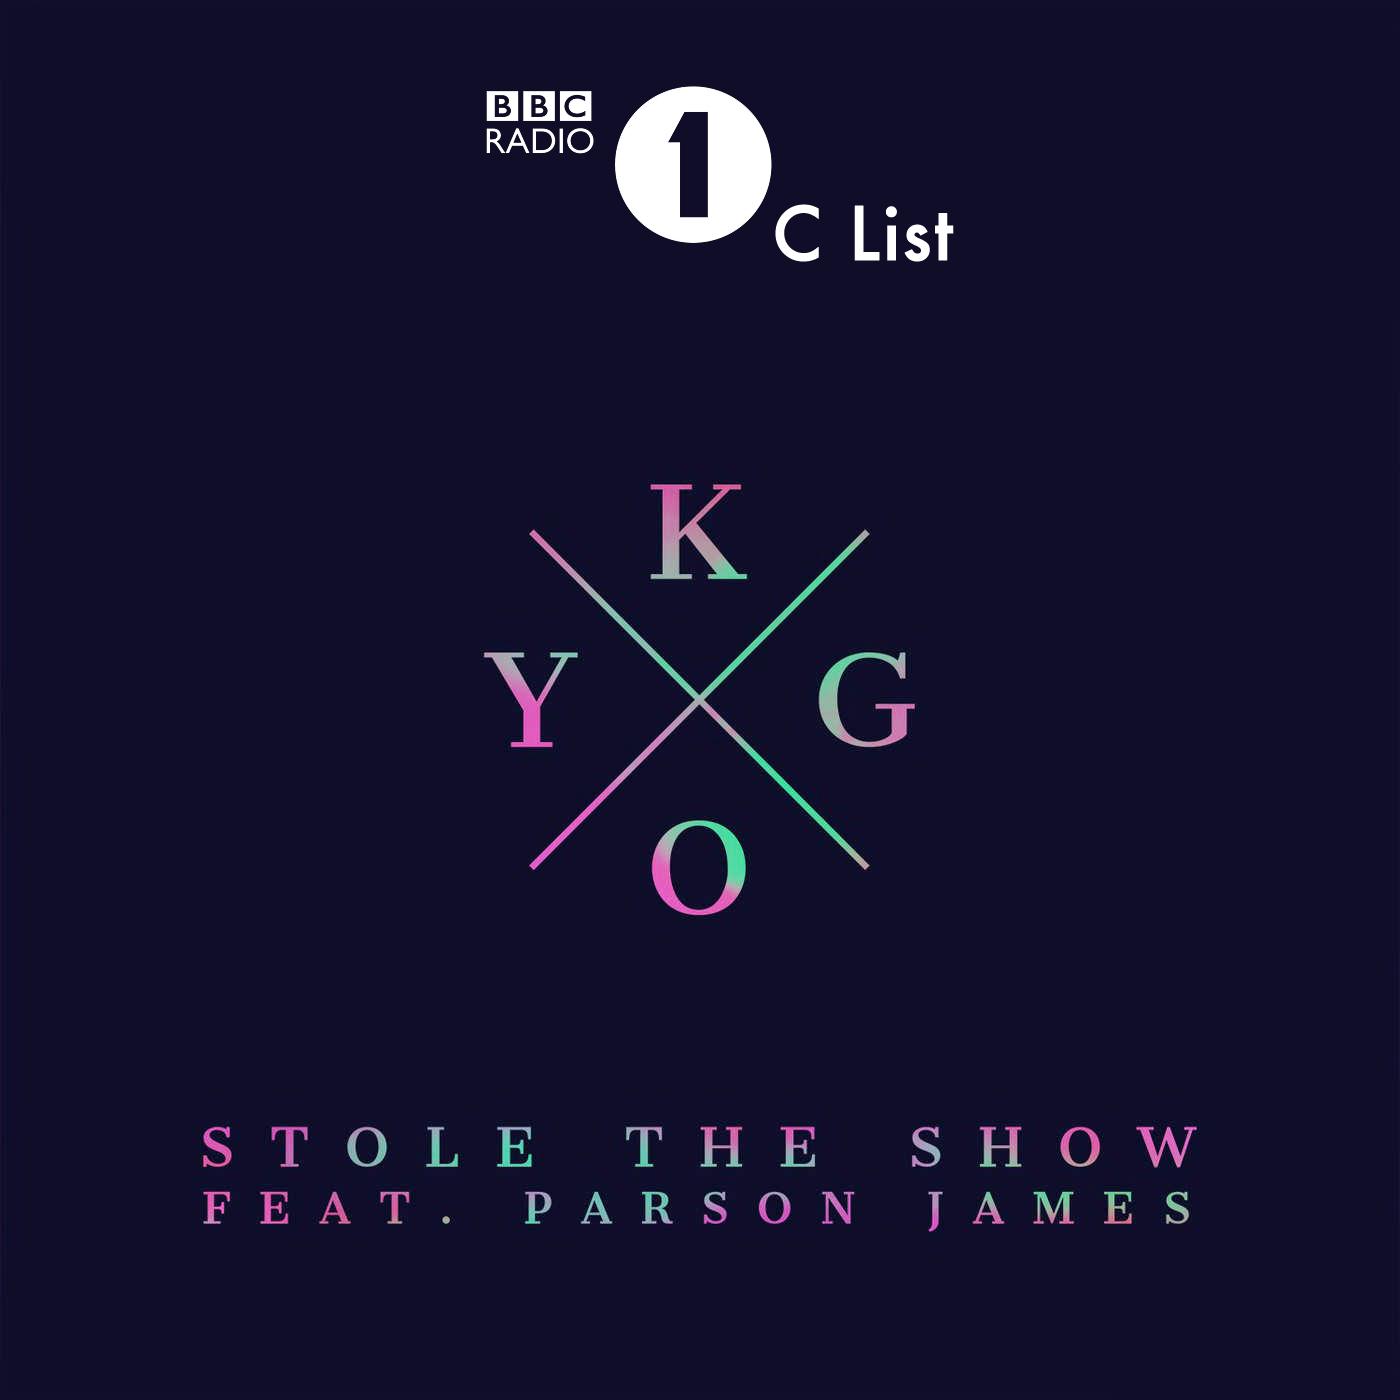 Kygo's 'Stole The Show' added to Radio 1 playlist